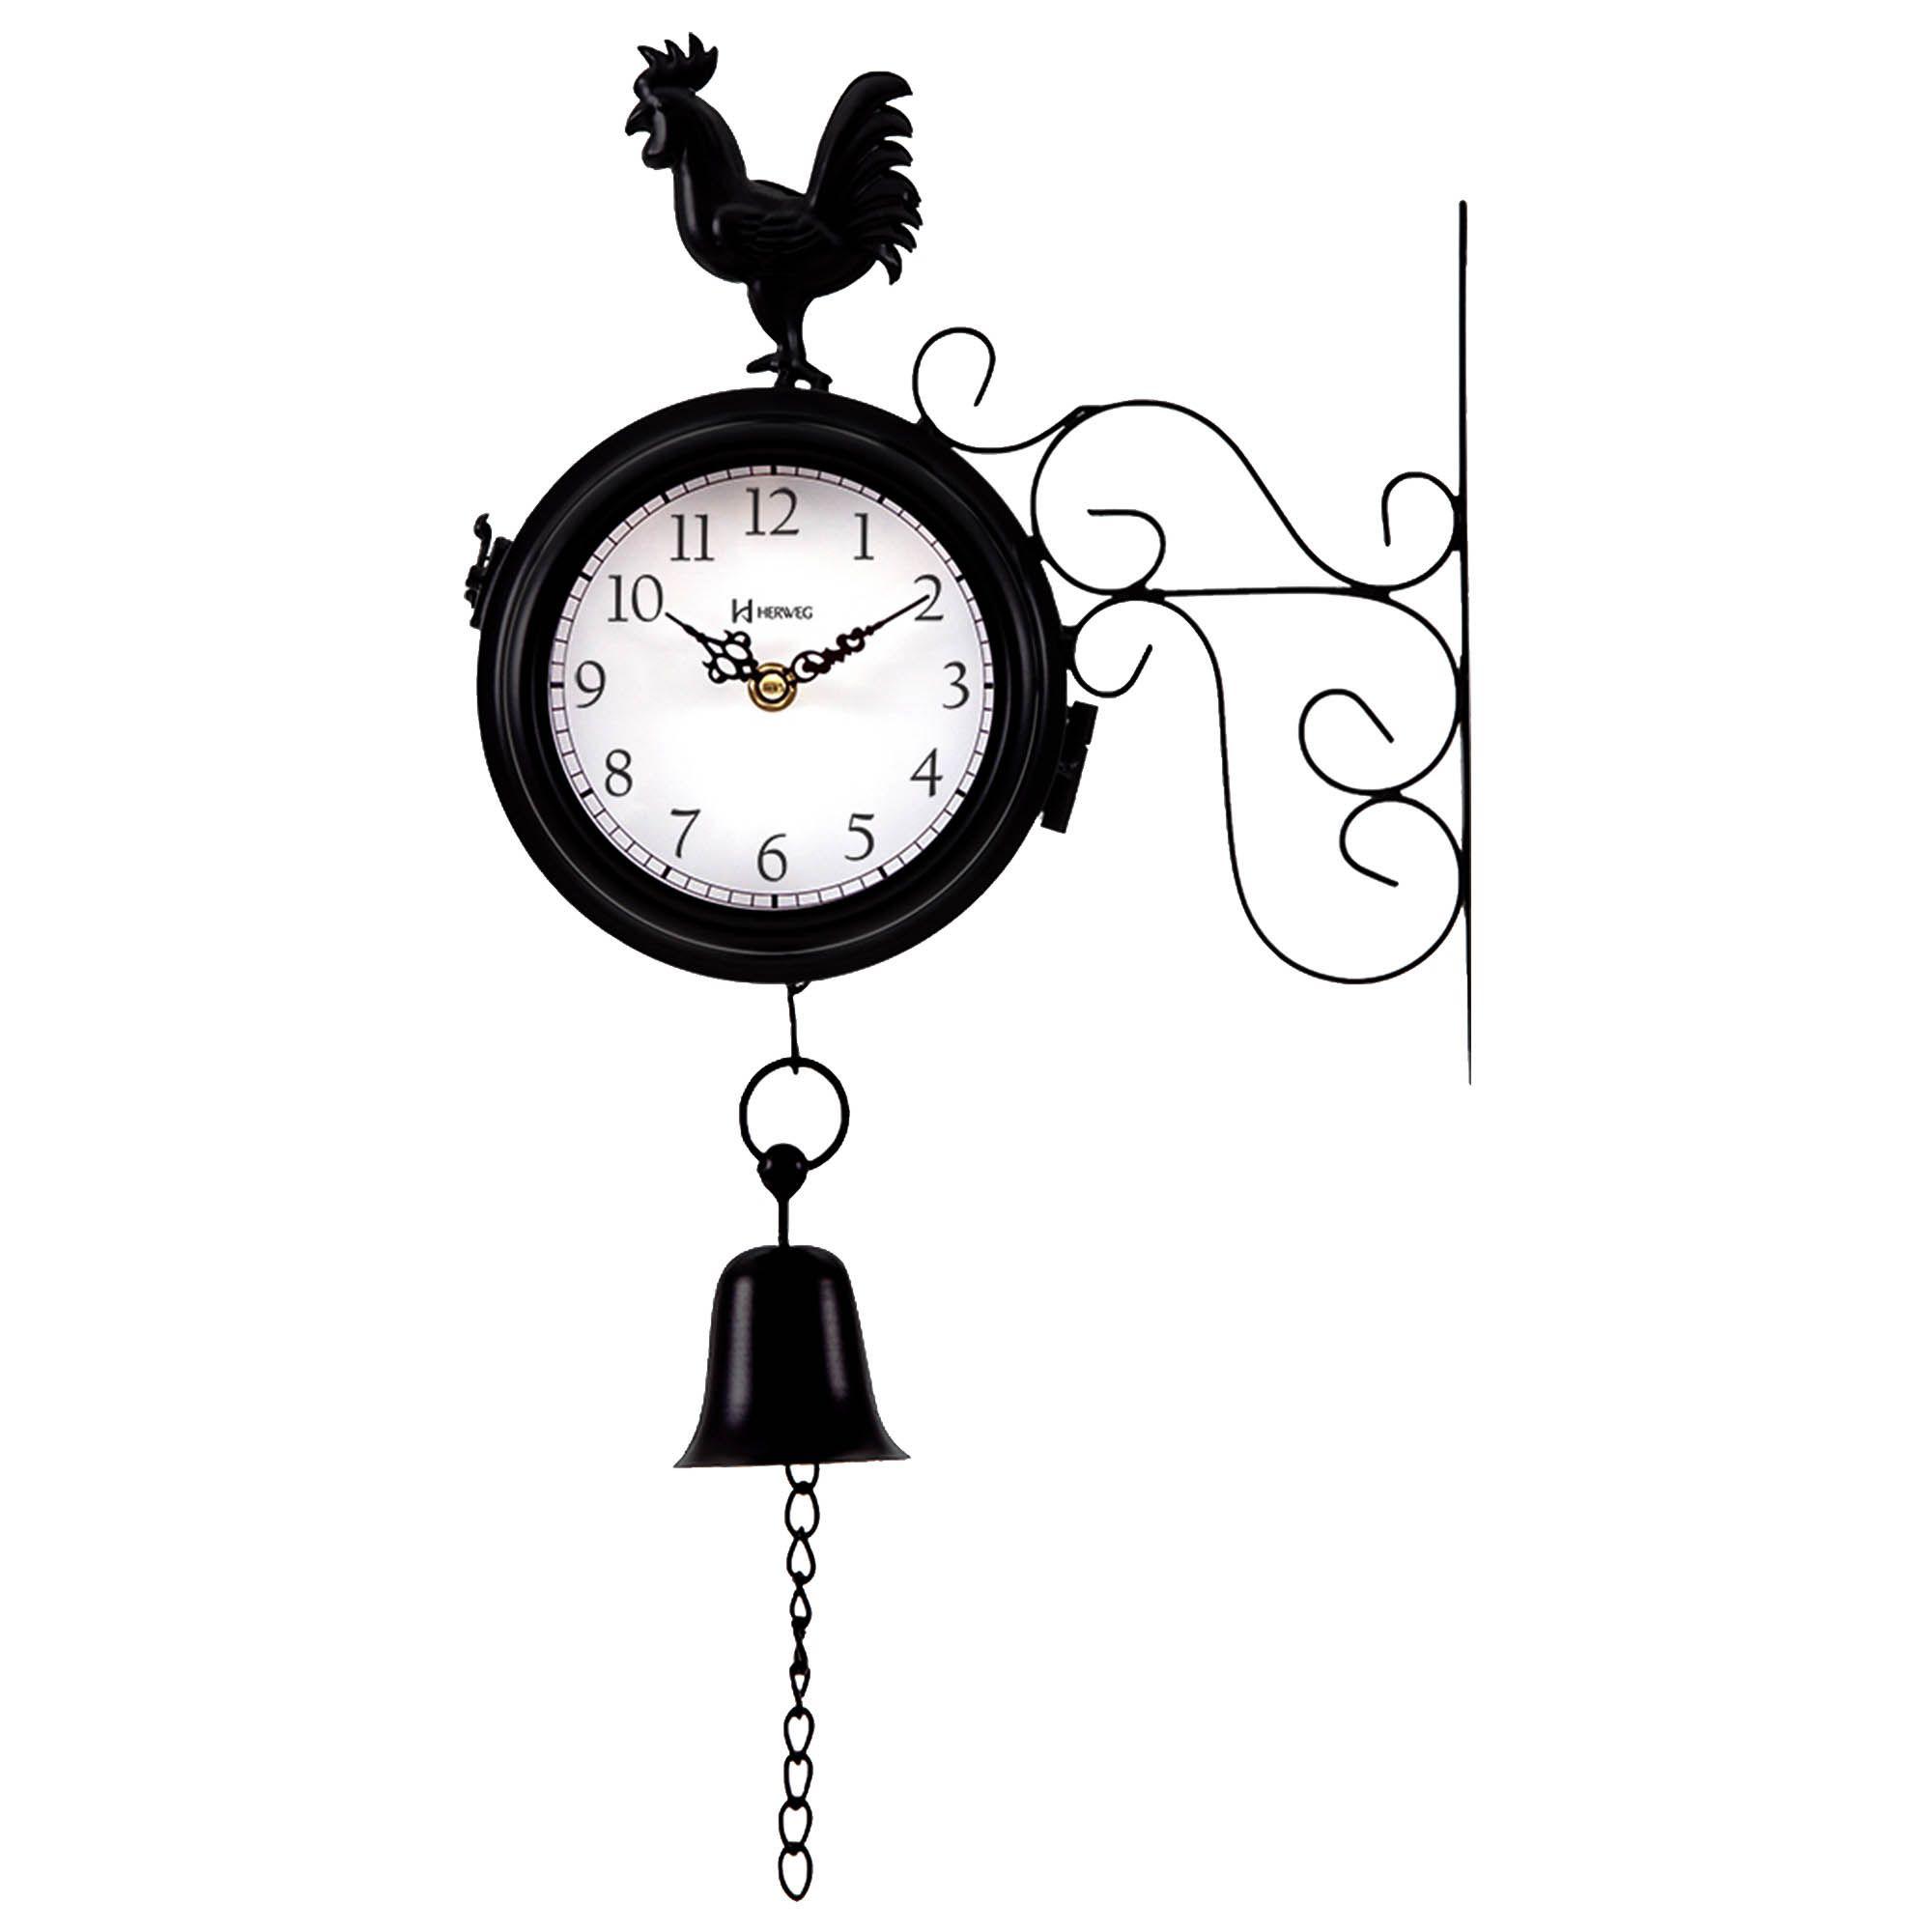 Relógio de Parede Jardim Herweg 6489 034 Preto